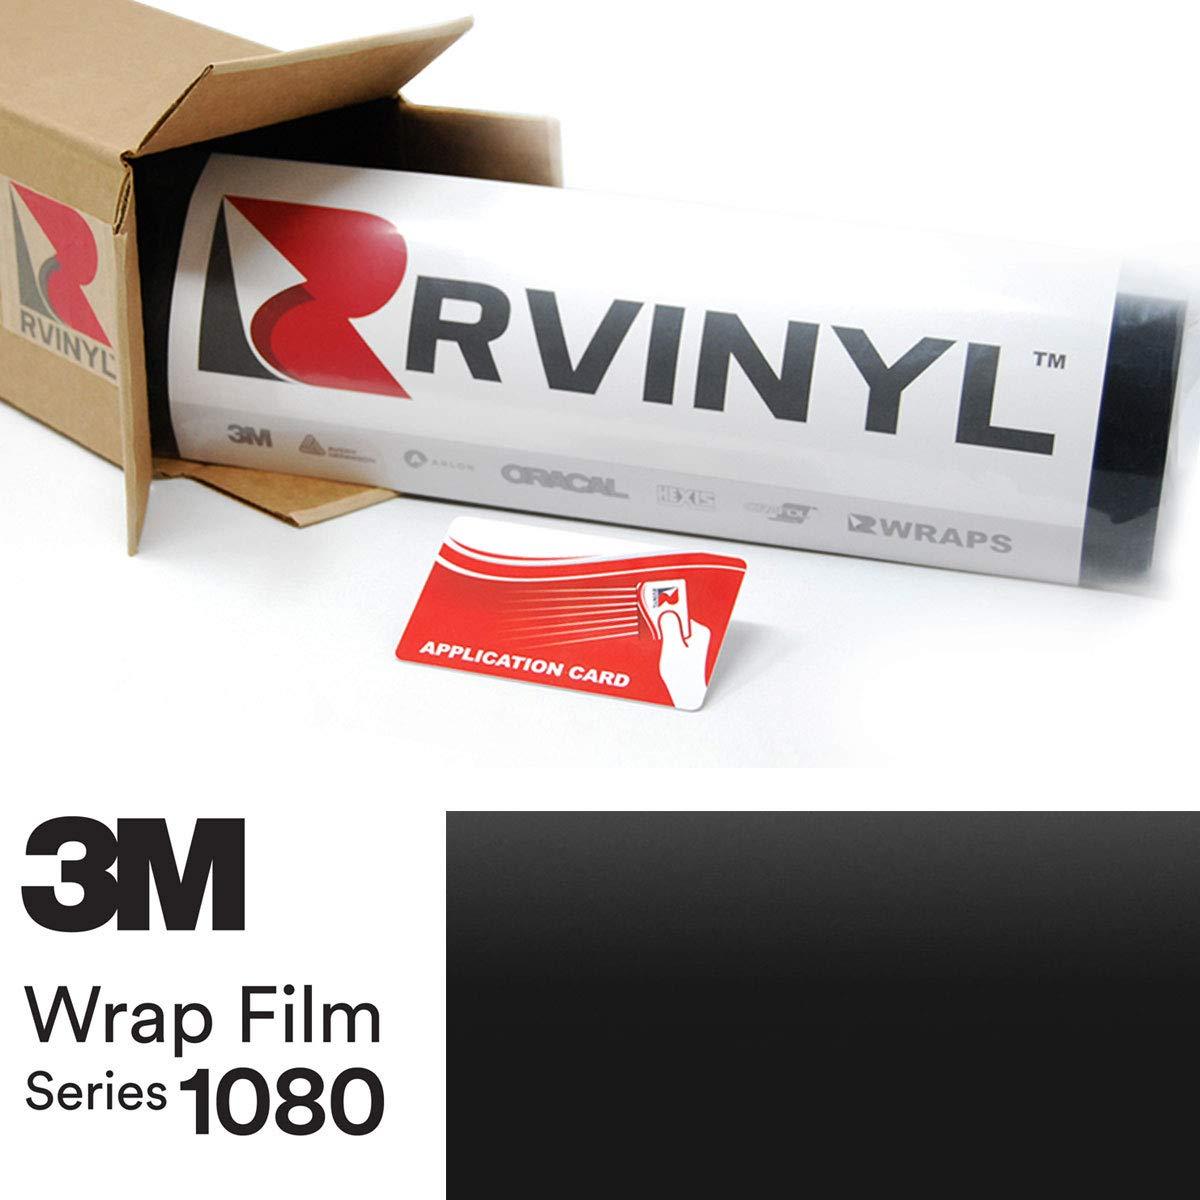 3M 1080 M22 Matte DEEP Black 4in x 6in Vinyl Vehicle Car Wrap Film Sheet Roll Sample Size